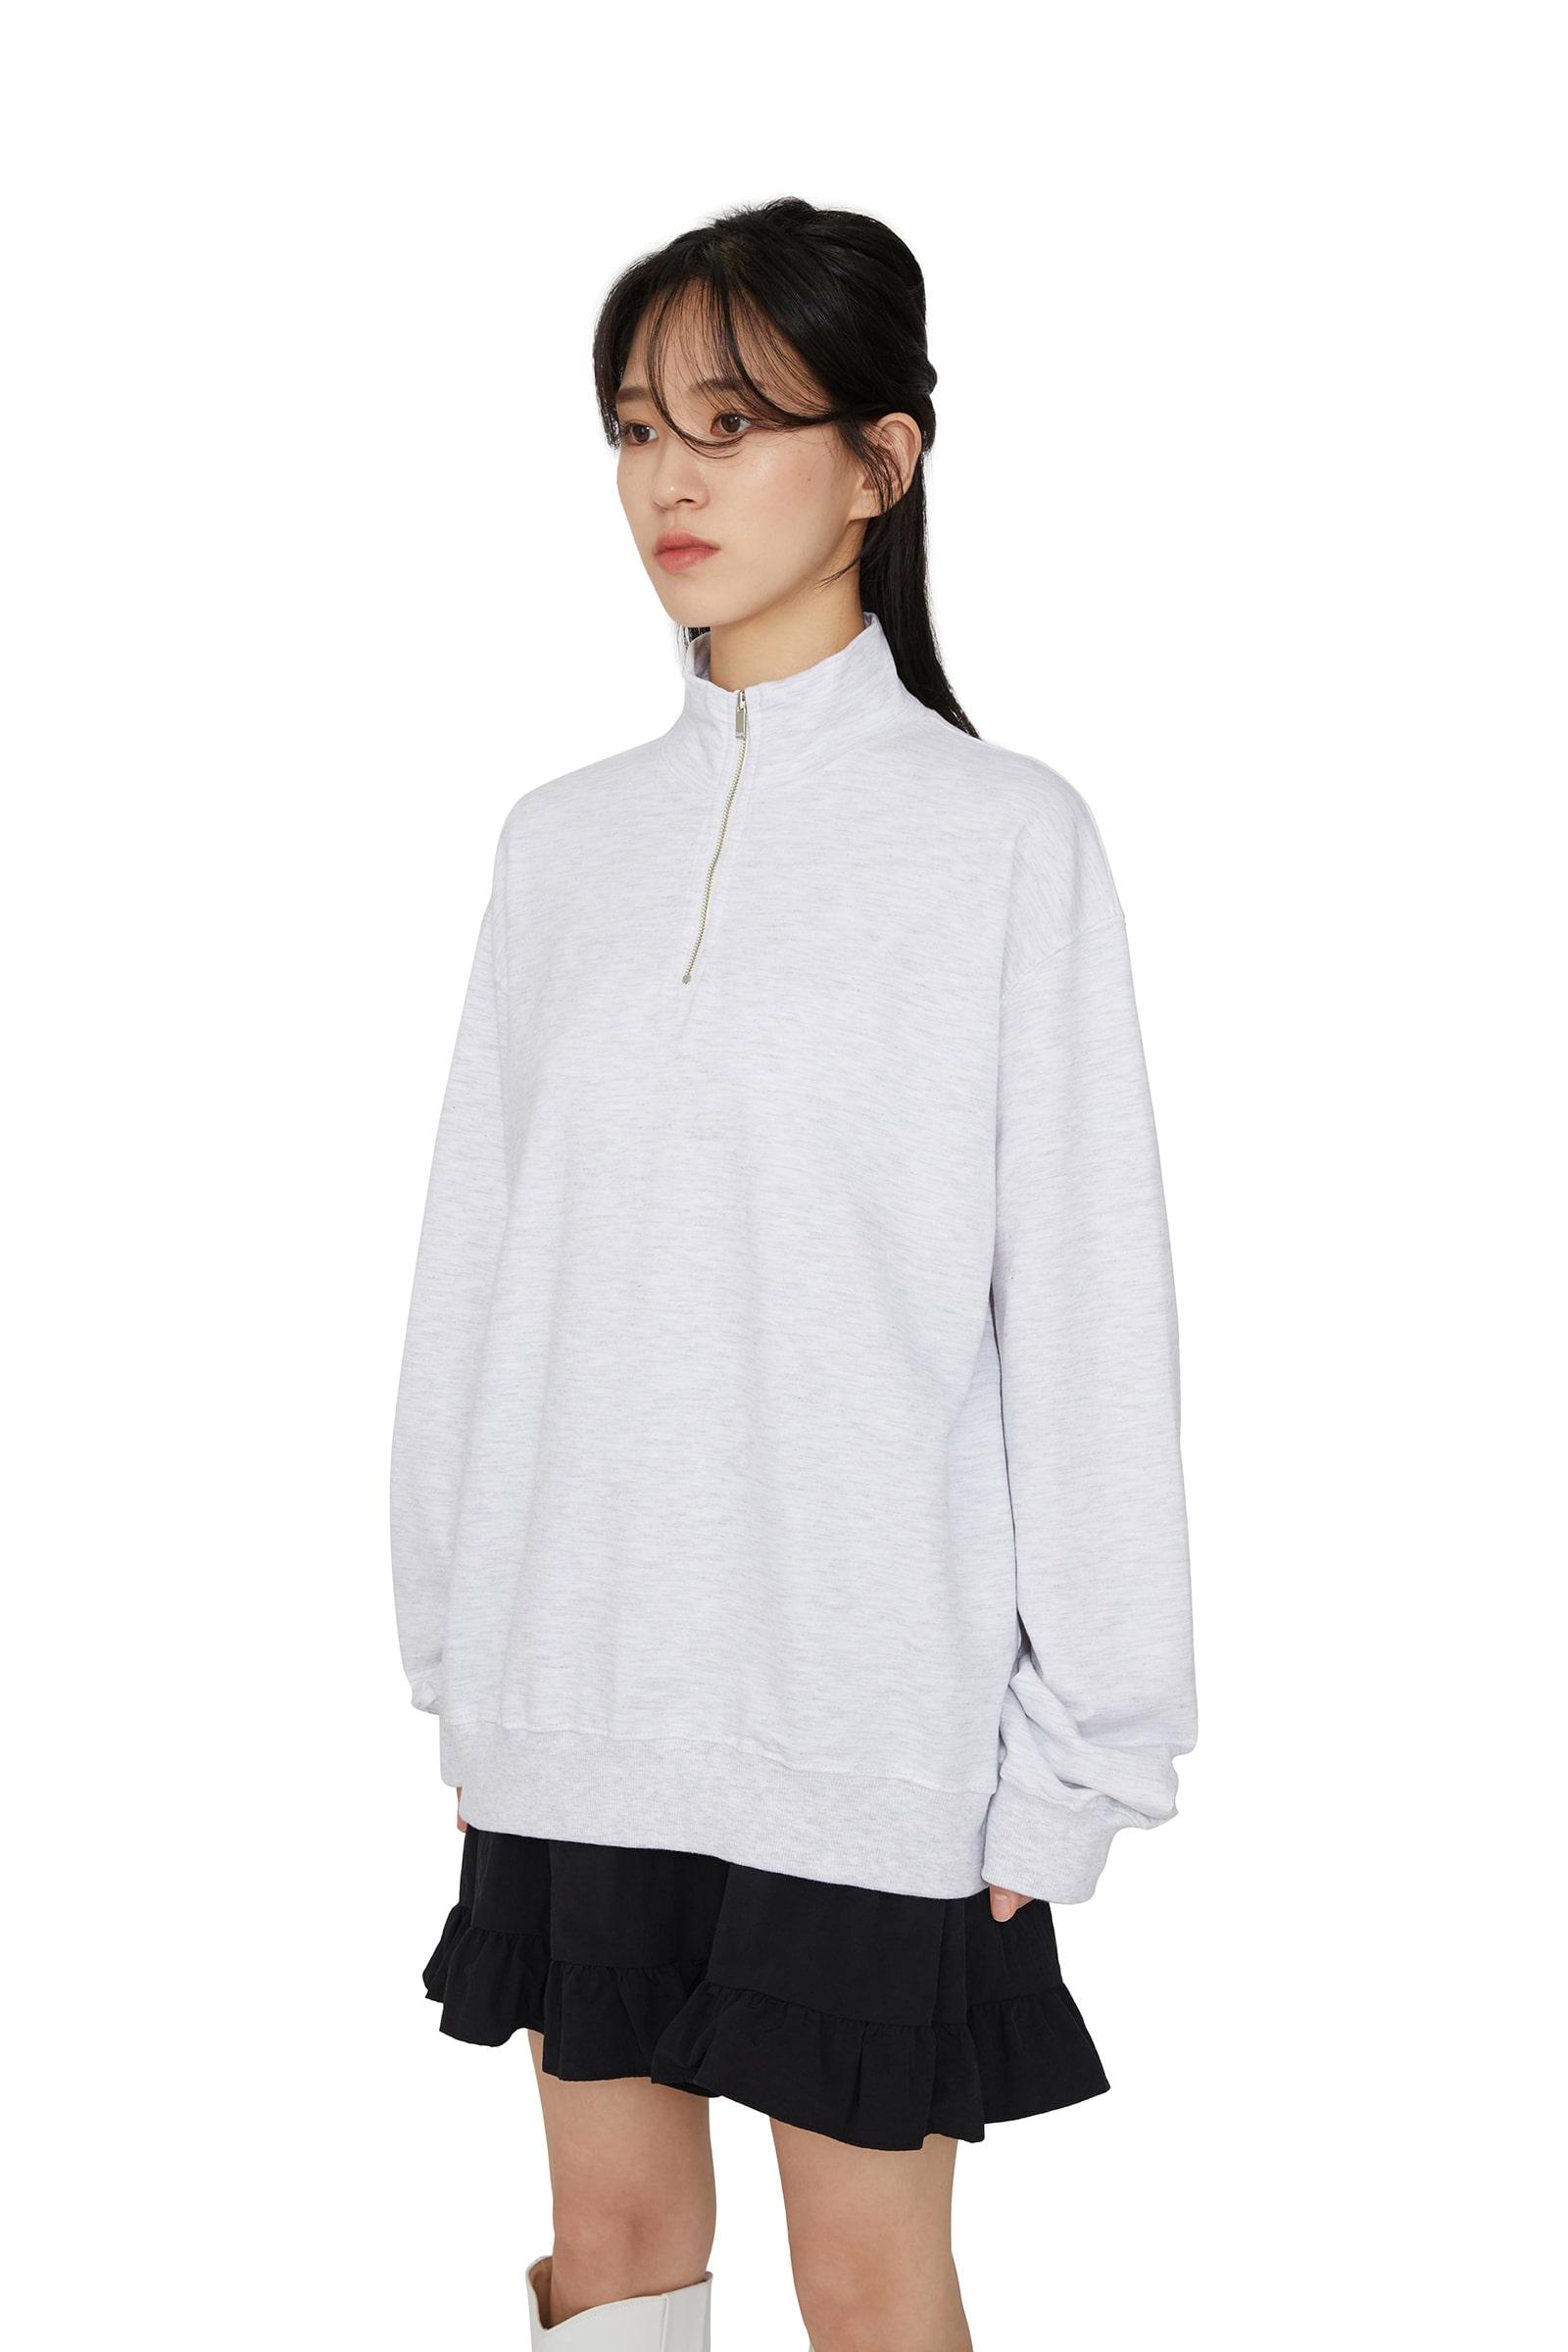 Dave cotton zip-up sweatshirt